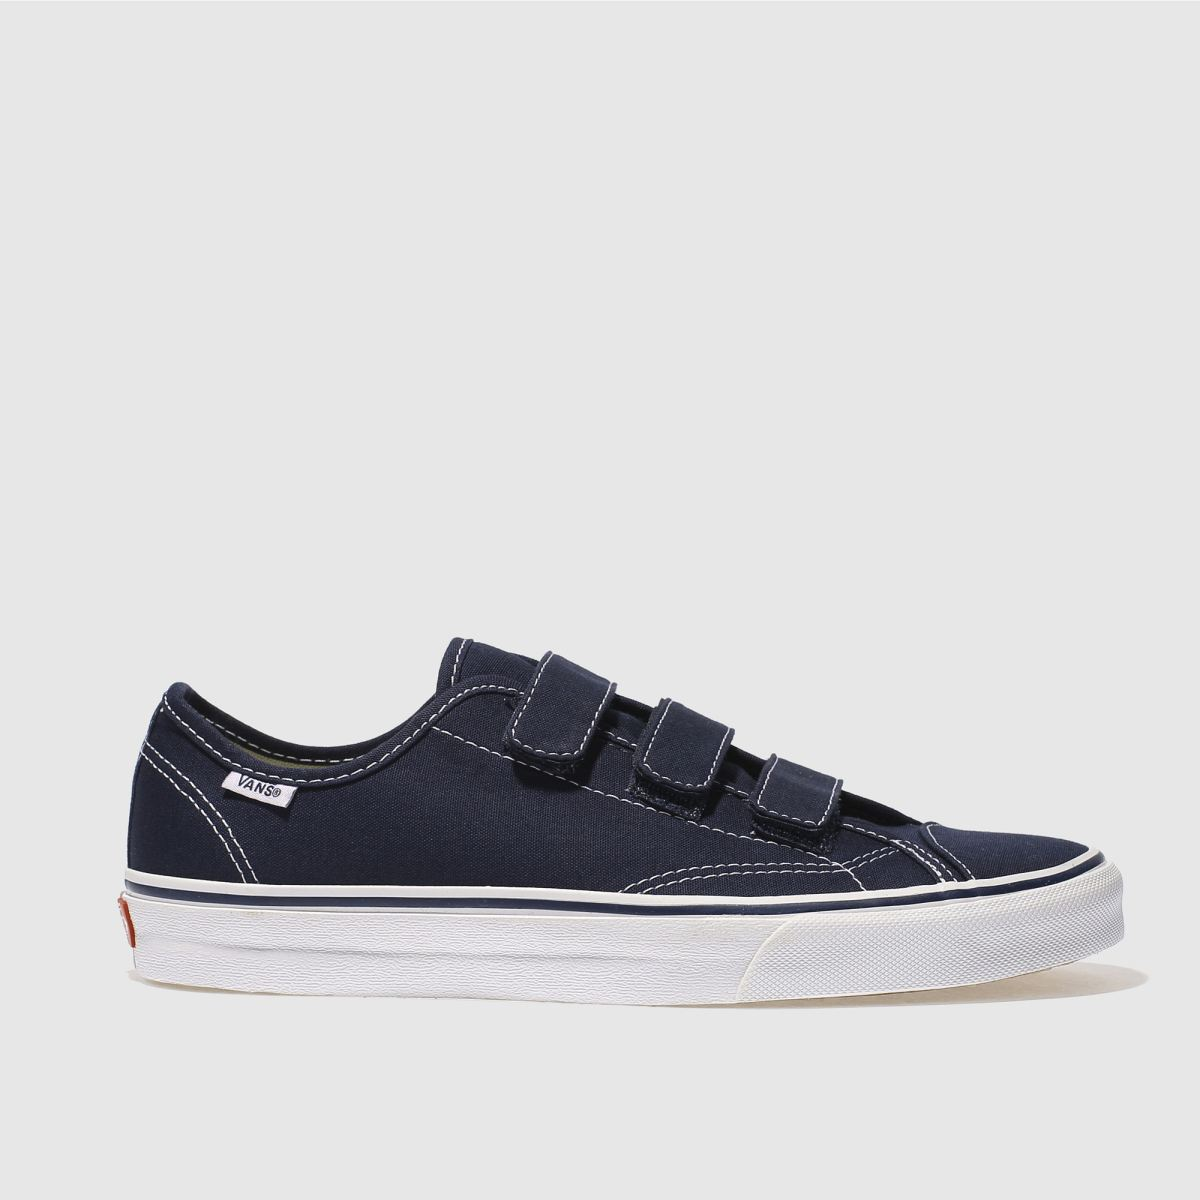 vans navy & white style 23 v trainers